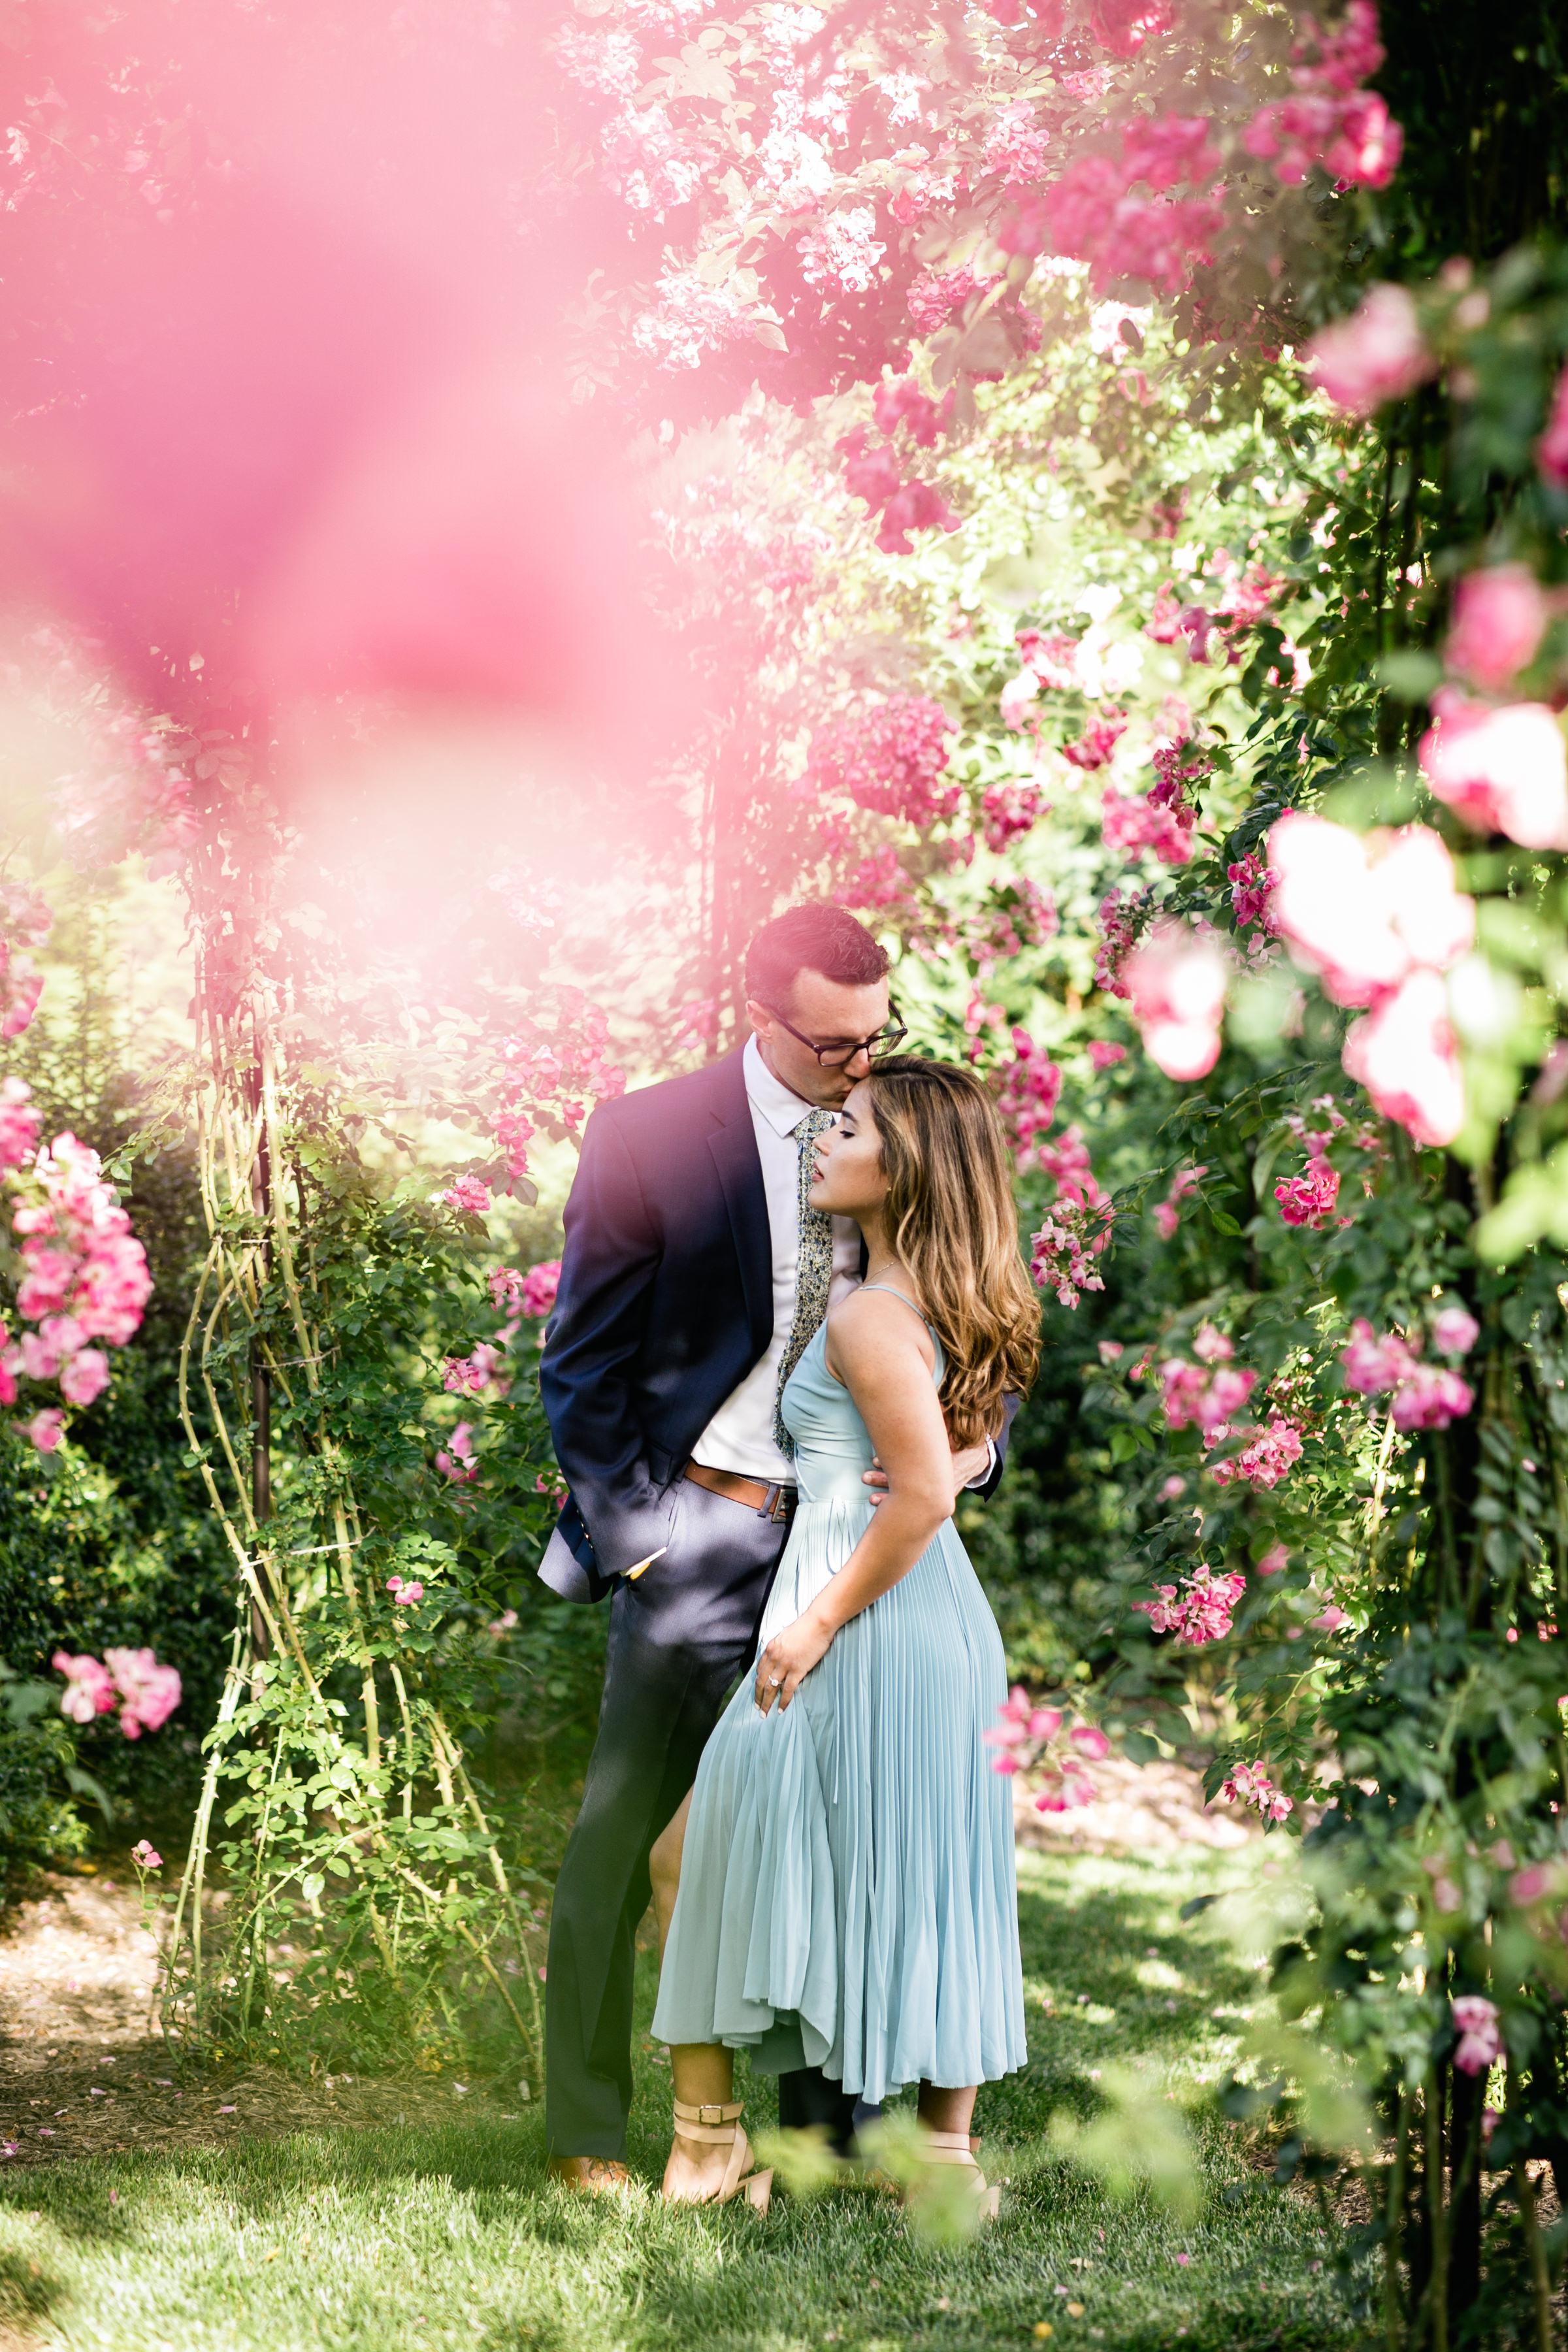 photography-natural-candid-engaged-proposal-philadelphia-wedding-longwood gardends-nature-flowers-modern-lifestyle-06.JPG